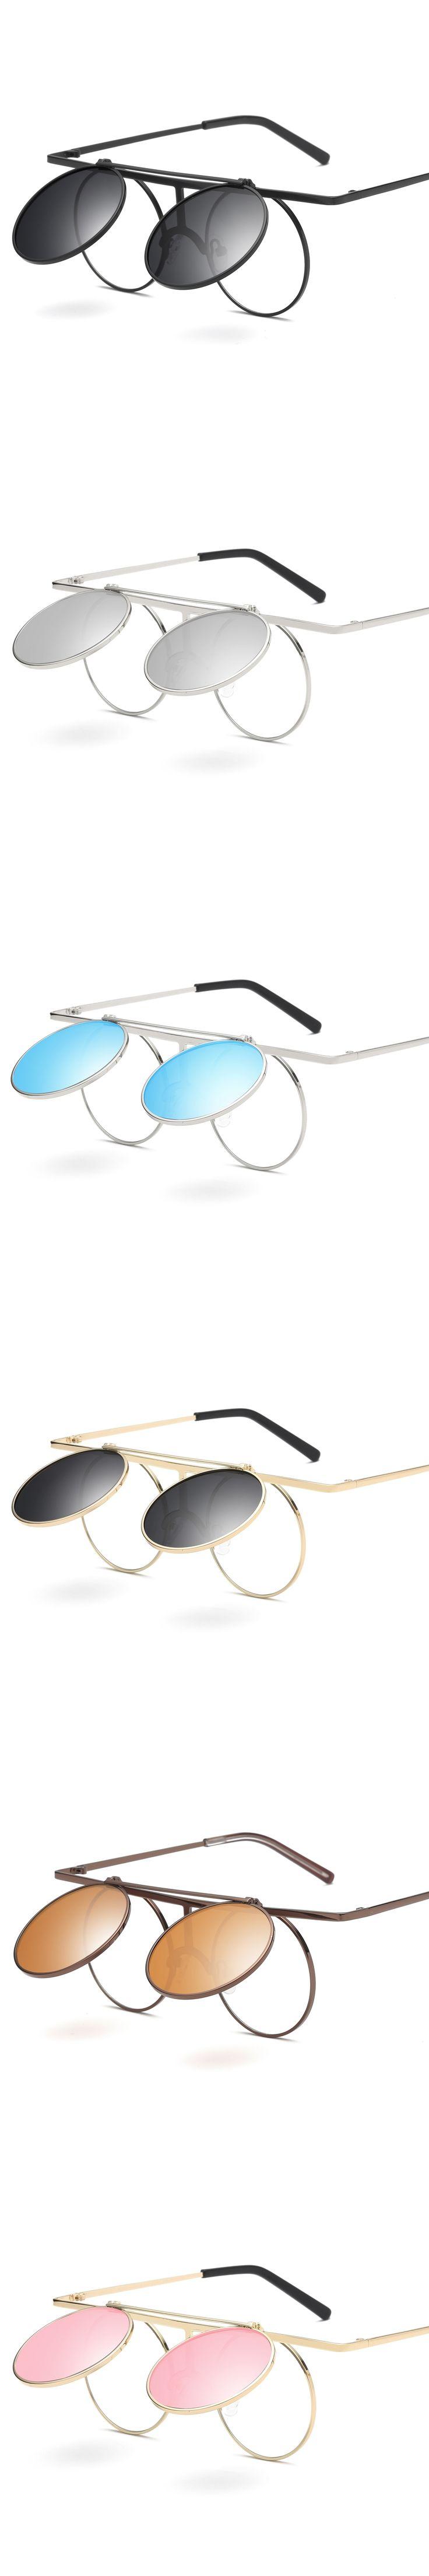 Stylish Steampunk Flip Sunglasses Round Designer Steam Punk Metal Polarized Sunglasses Retro Circle Sun Glasses for Women Men